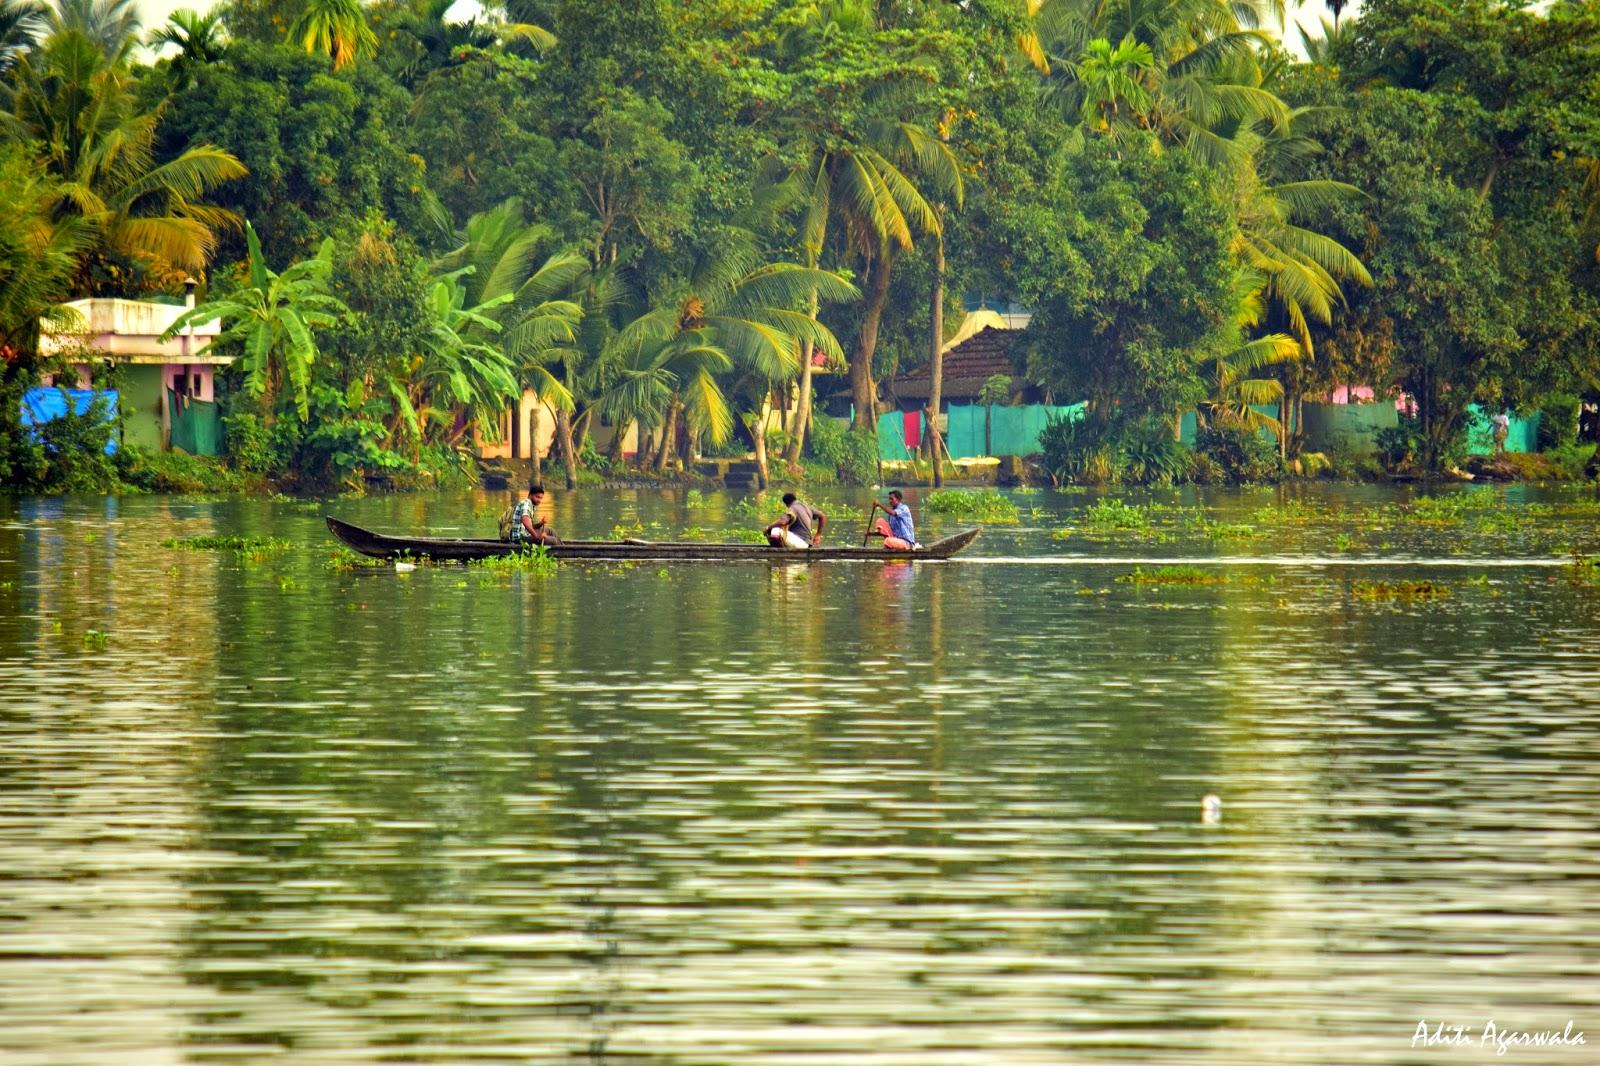 Fishermen rowing in the backwaters of Allepey, Kerala